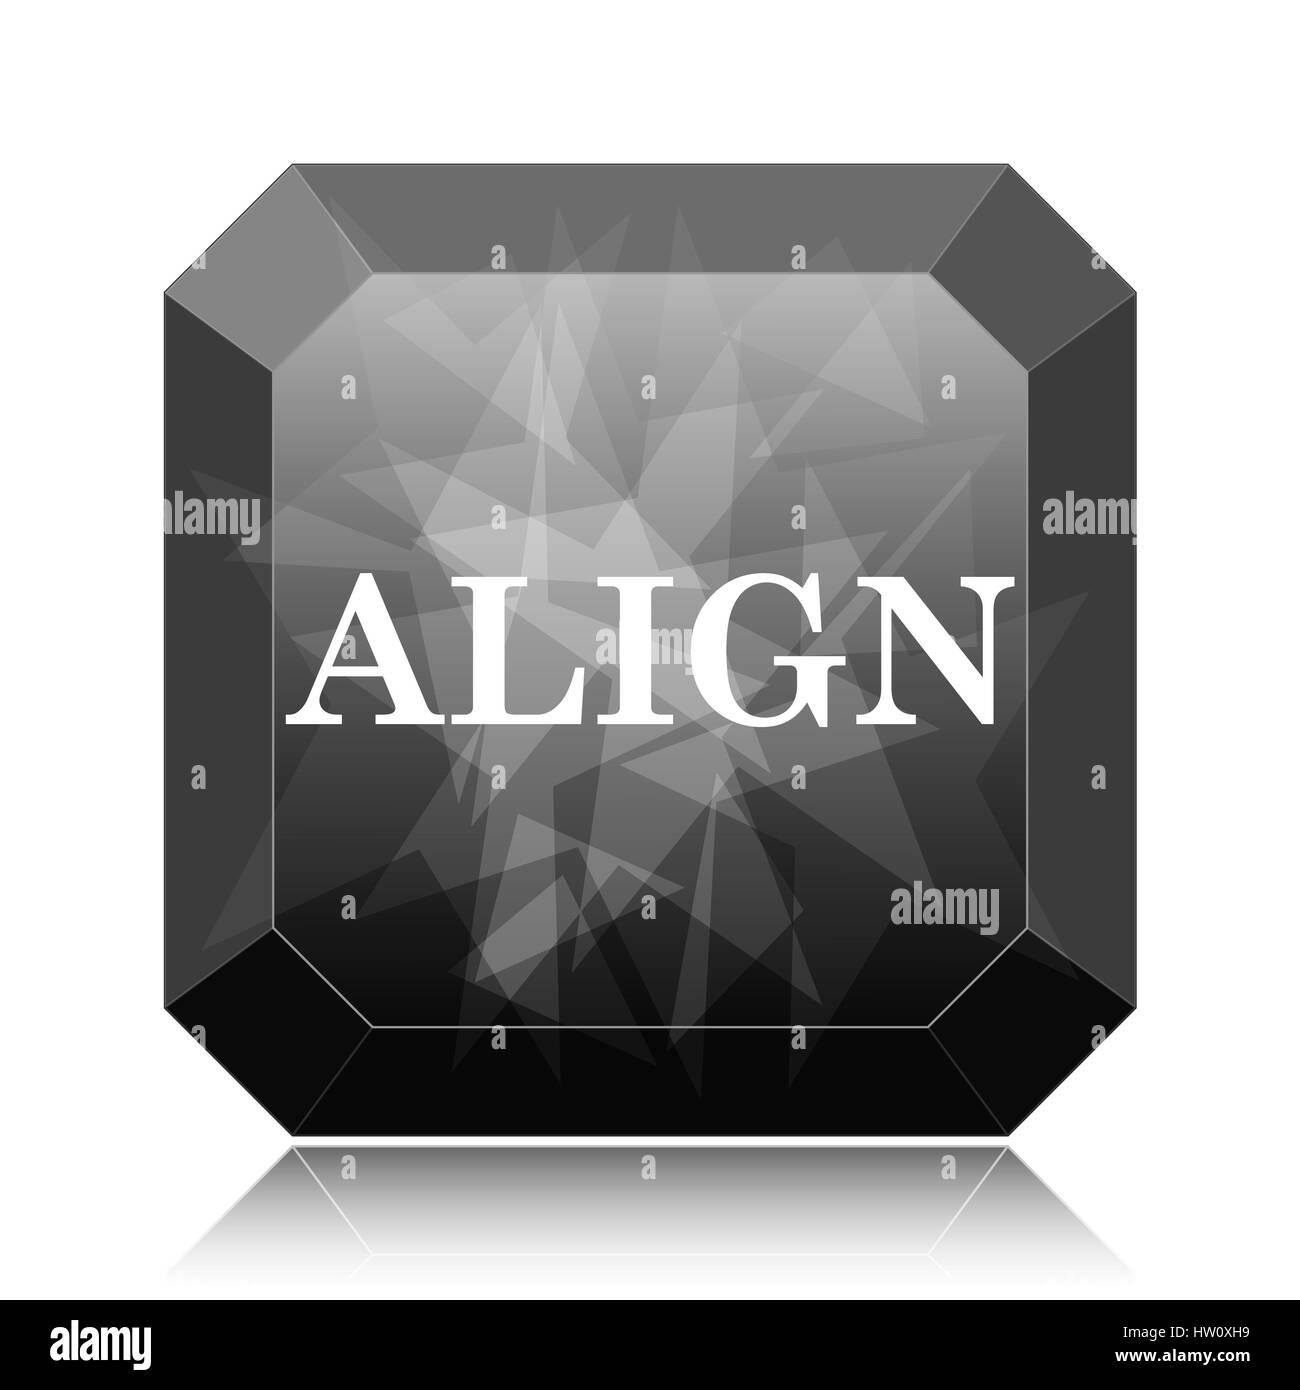 Background image align - Align Icon Black Website Button On White Background